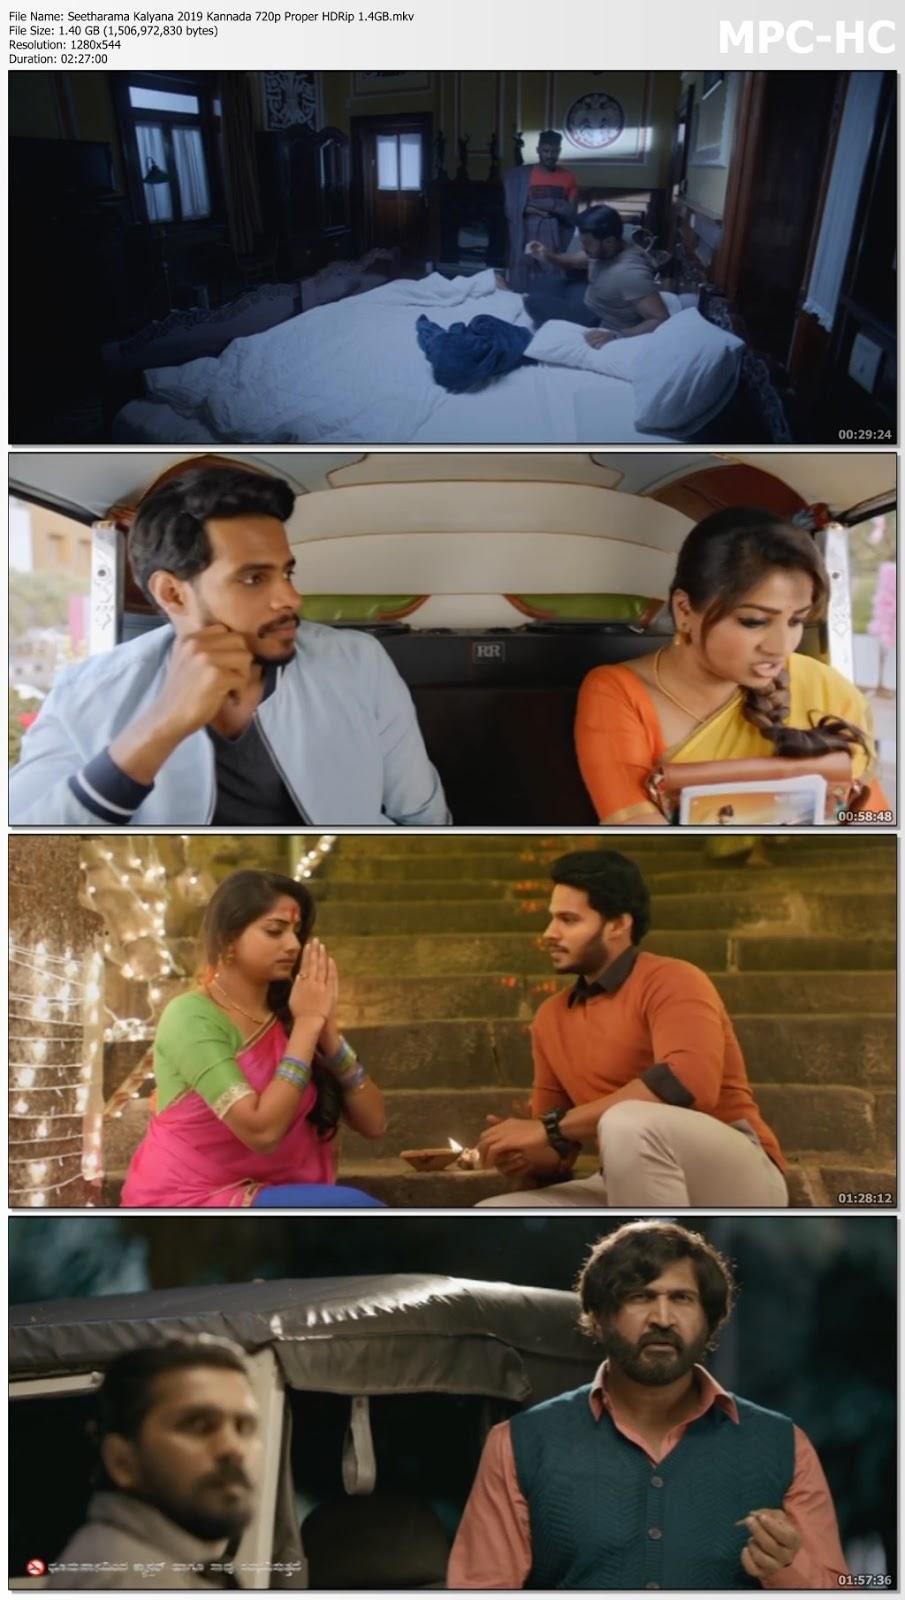 Seetharama Kalyana 2019 Kannada 720p Proper HDRip 1.4GB Desirehub